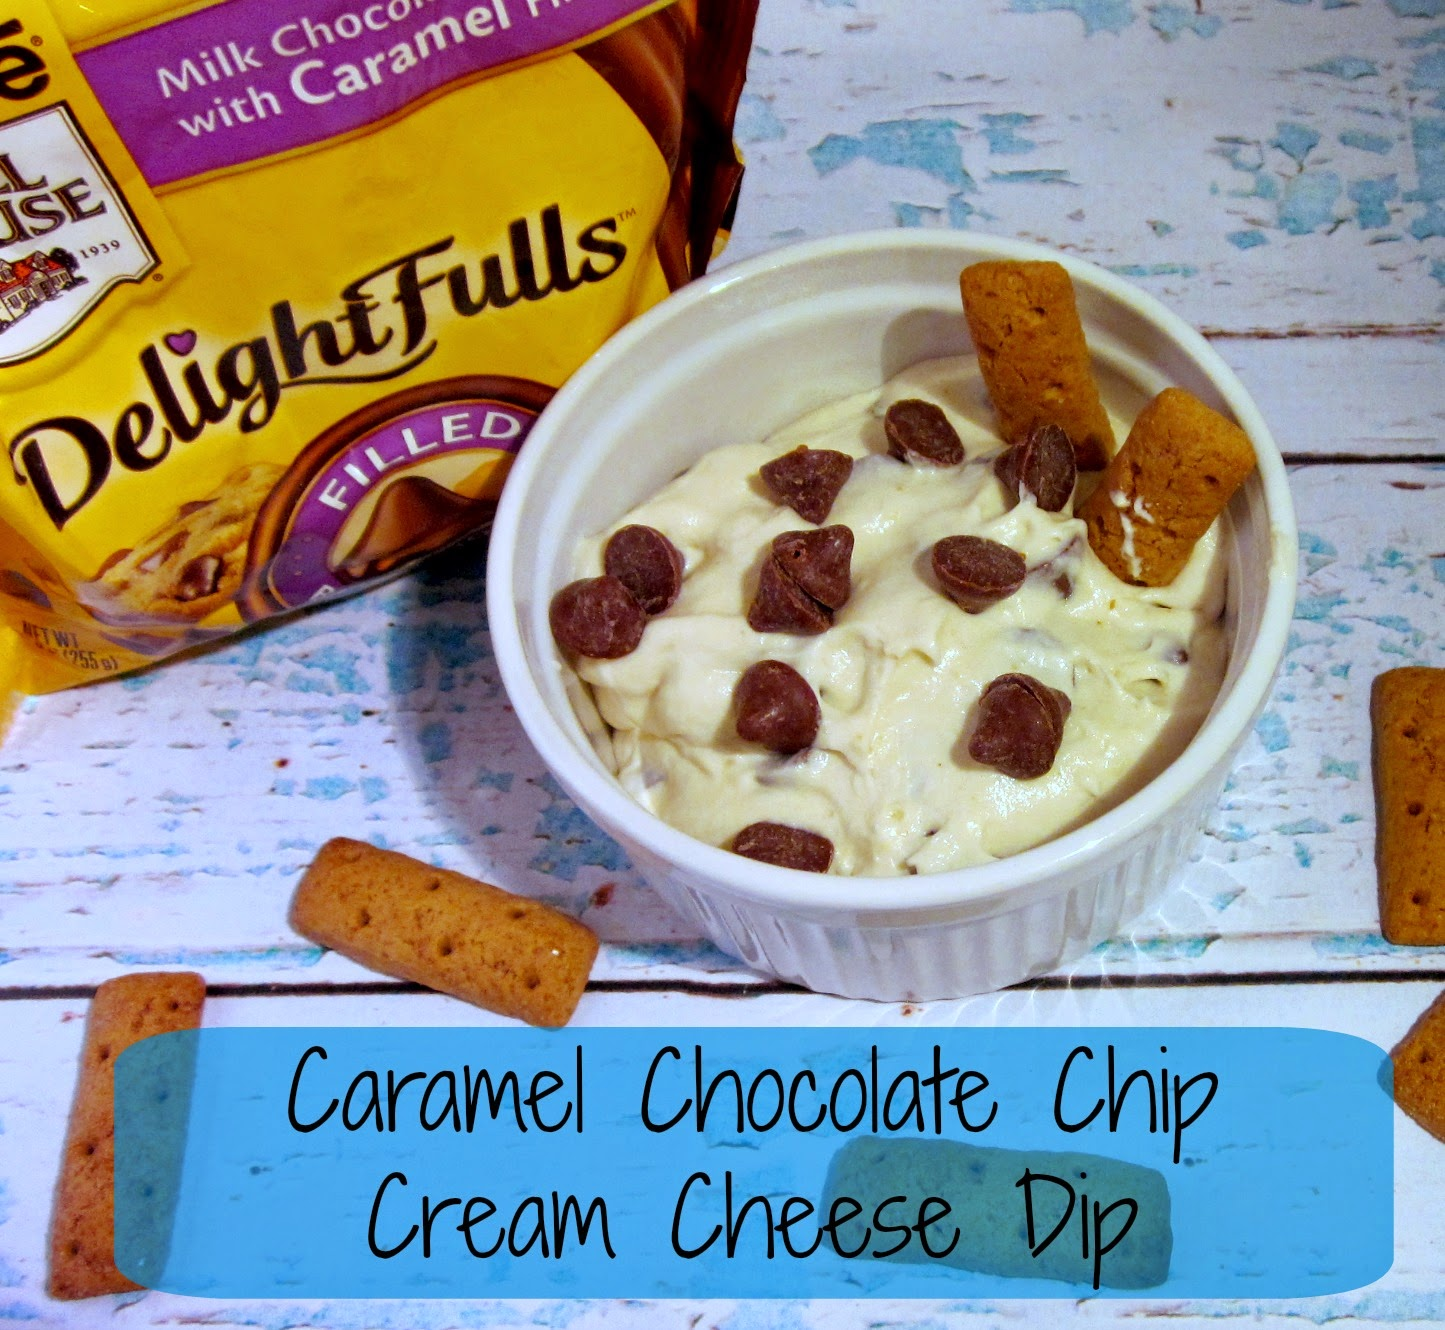 Cream Cheese Chocolate Chip Dip, Nestle DelightFulls recipes, Nestle Toll House DelightFulls, Nestle Toll House Holiday Recipes, Toll House Filled Morsels, Filled chocolate chip recipes